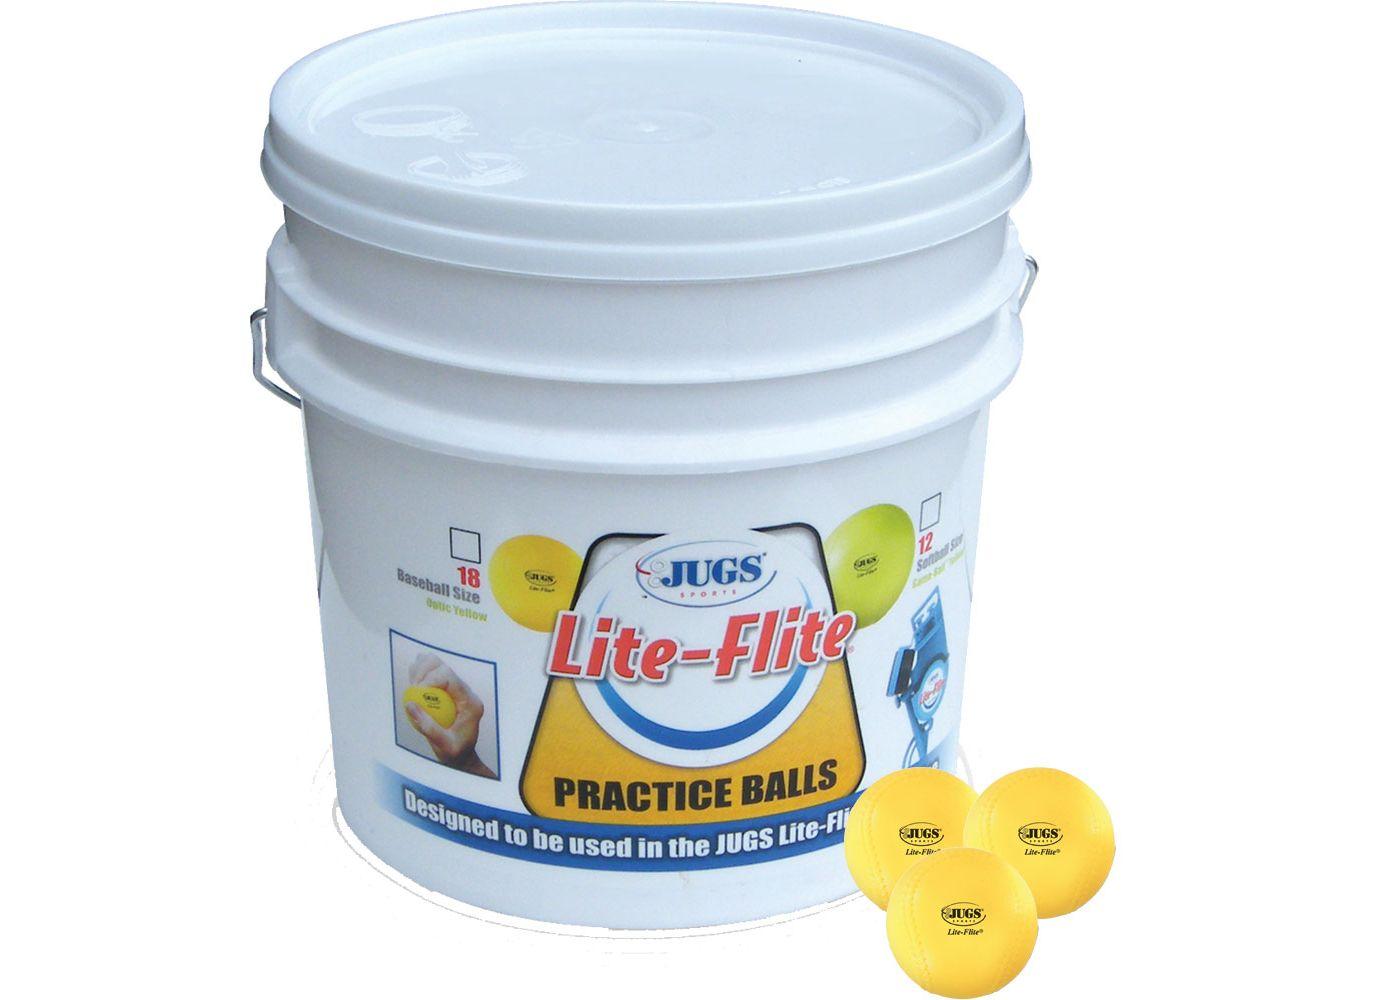 Jugs Lite-Flite Bucket of Baseballs - 18 Pack